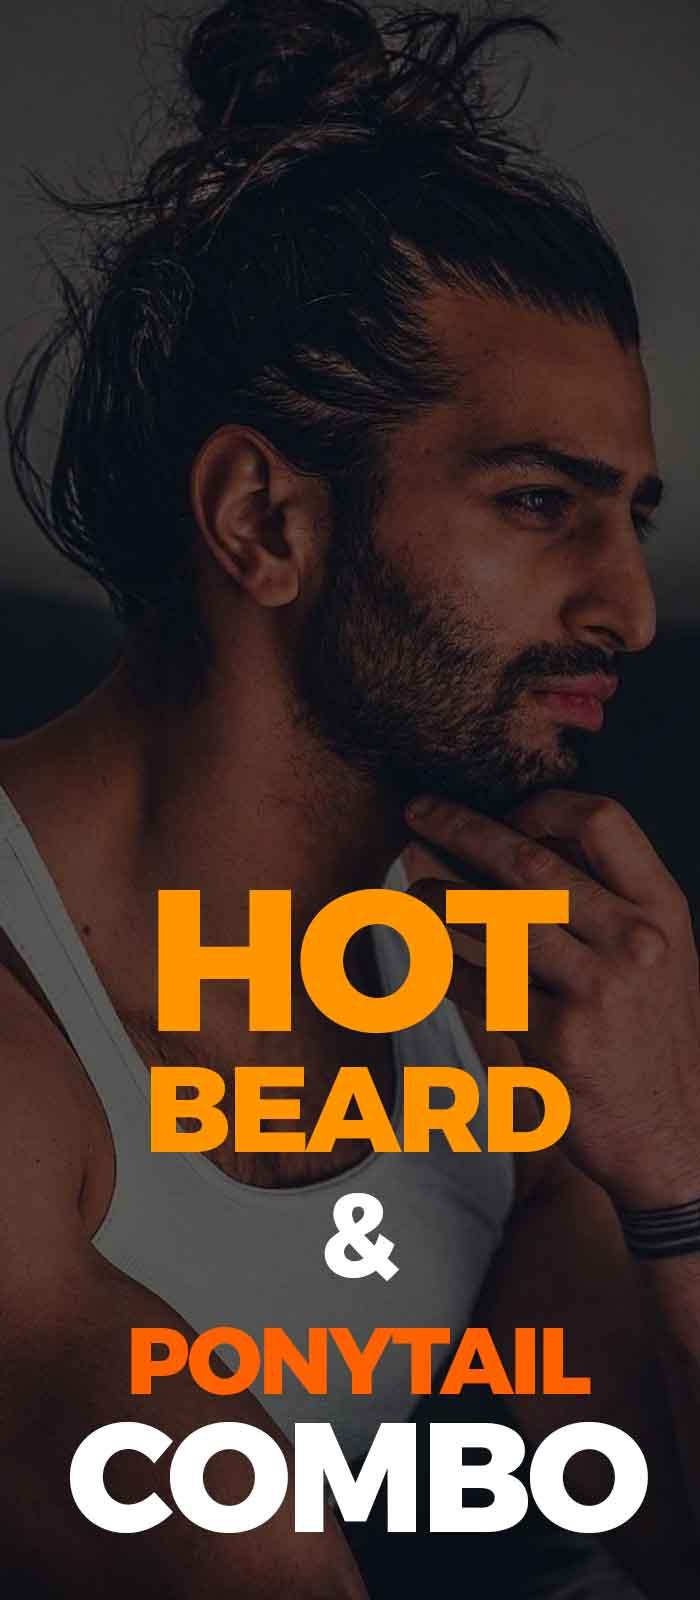 Full Man Bun Ponytail with sexy beard for men!